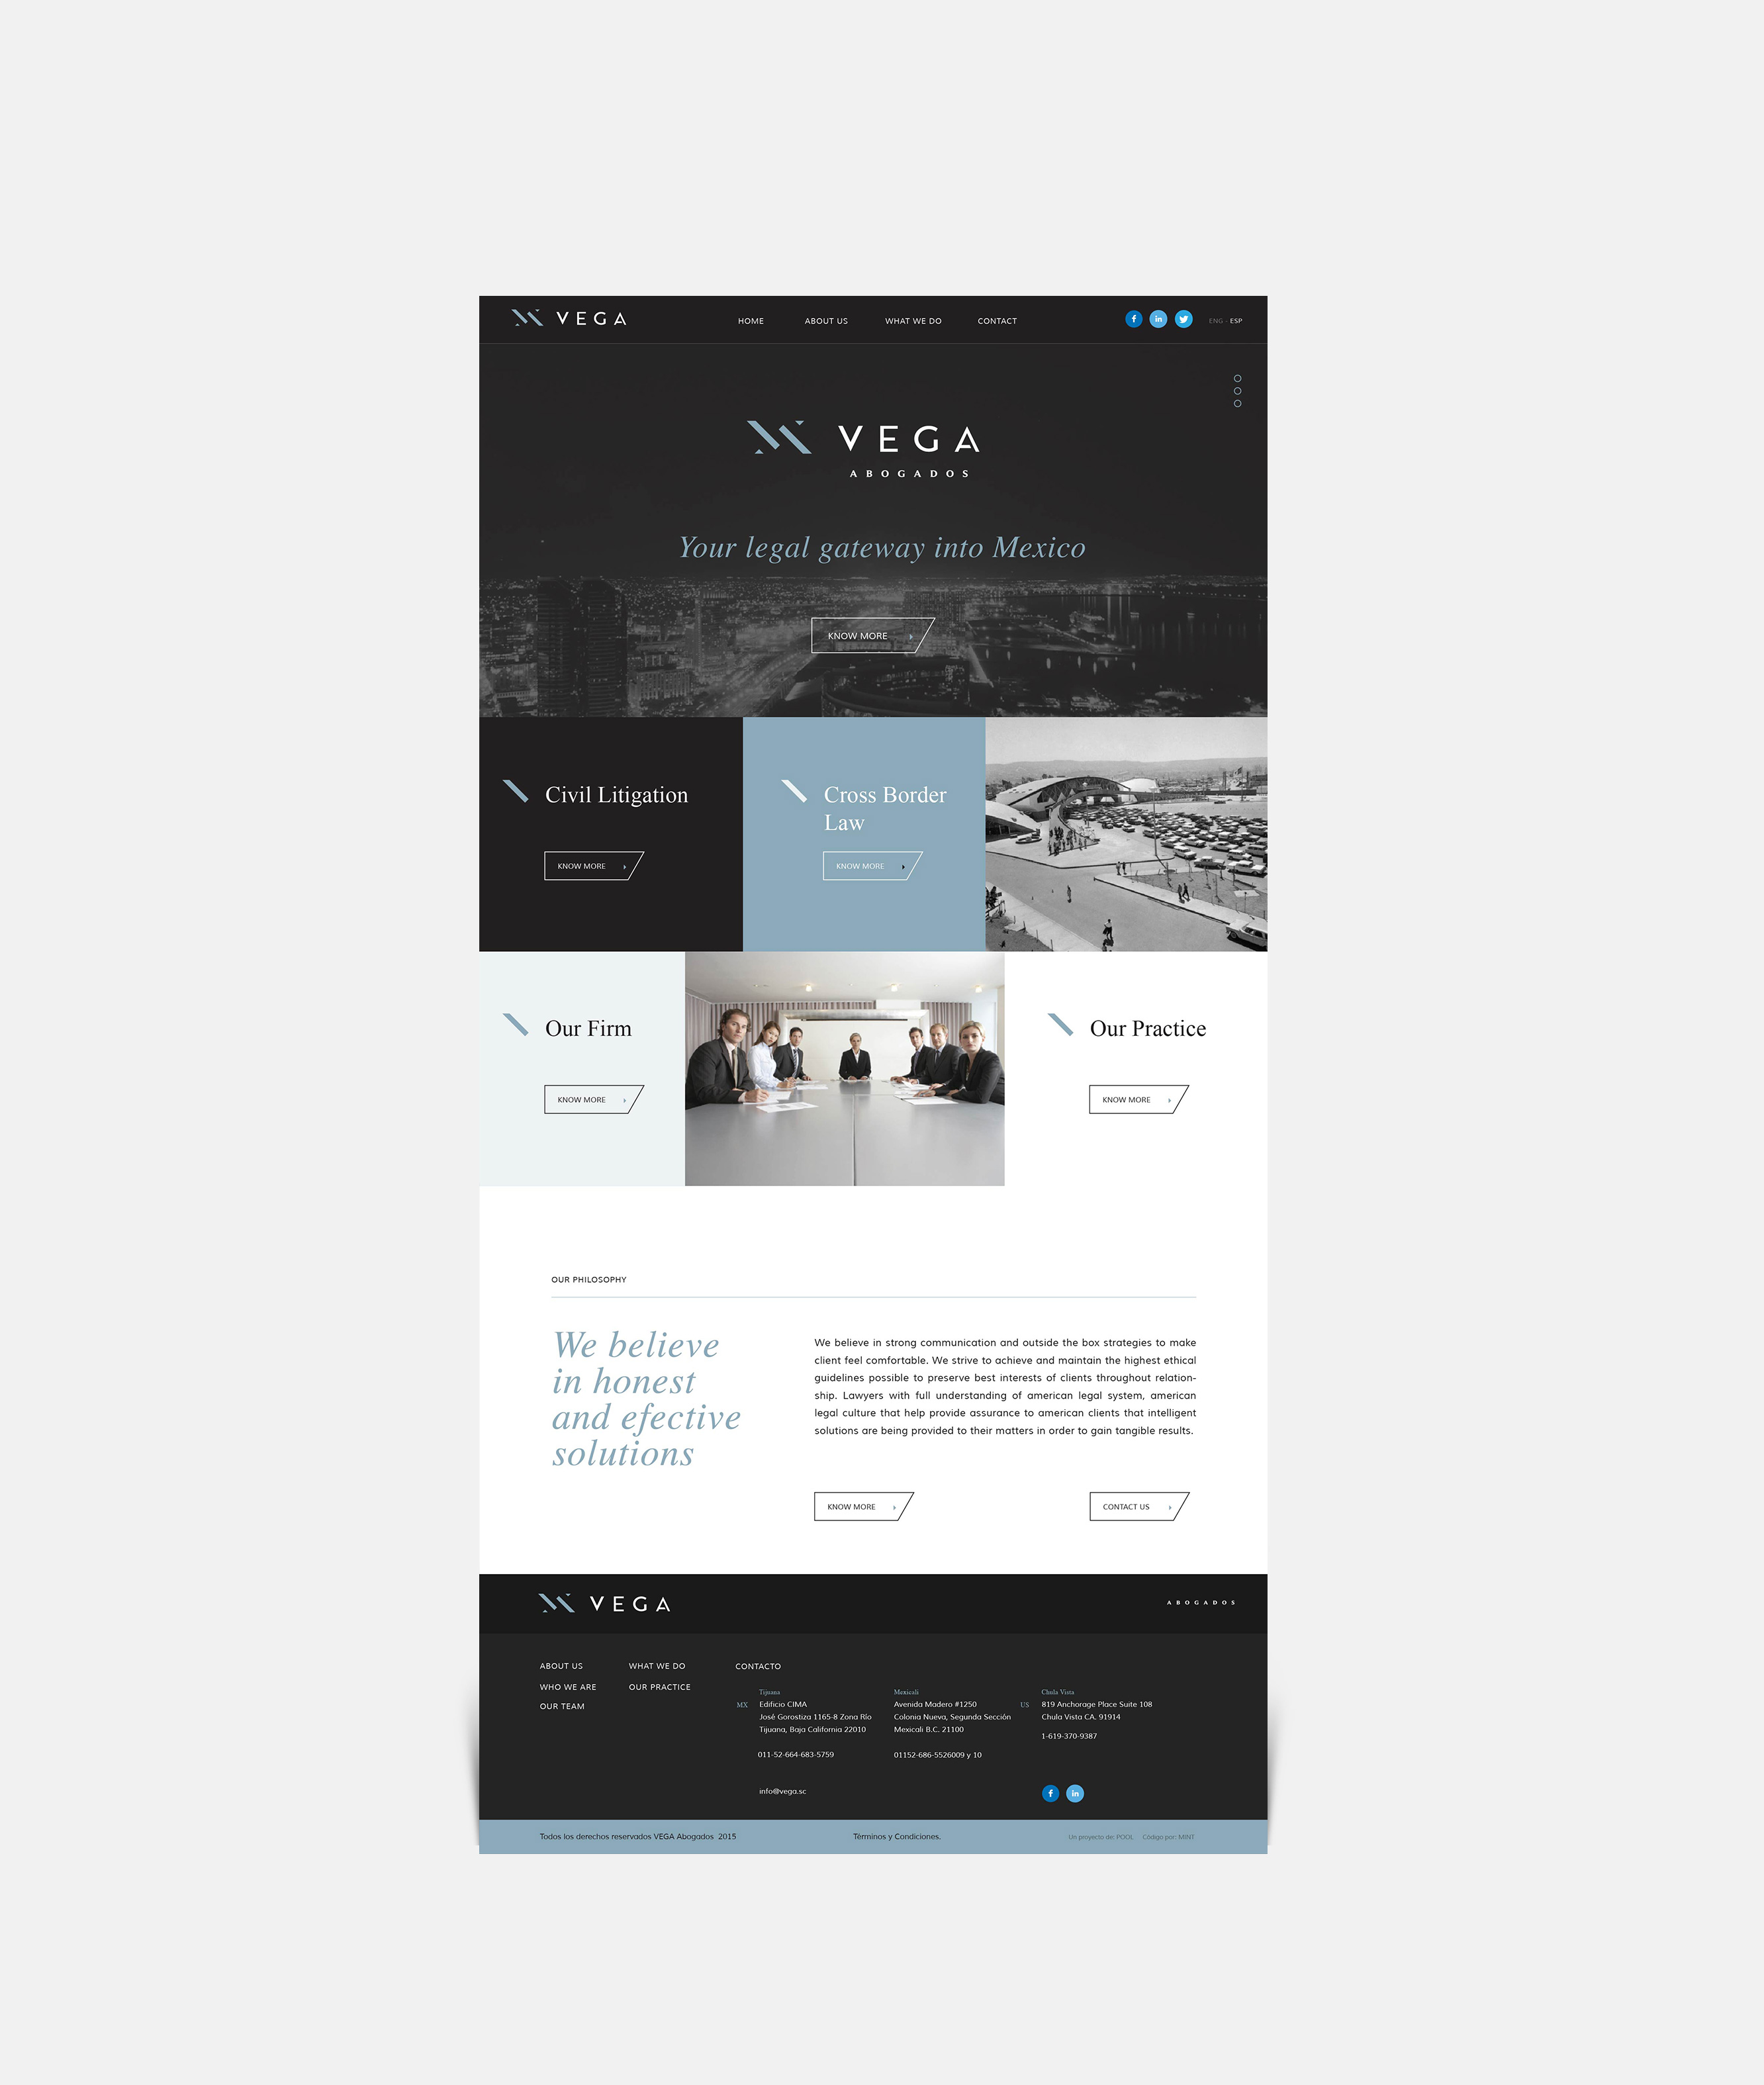 Vega-web-view